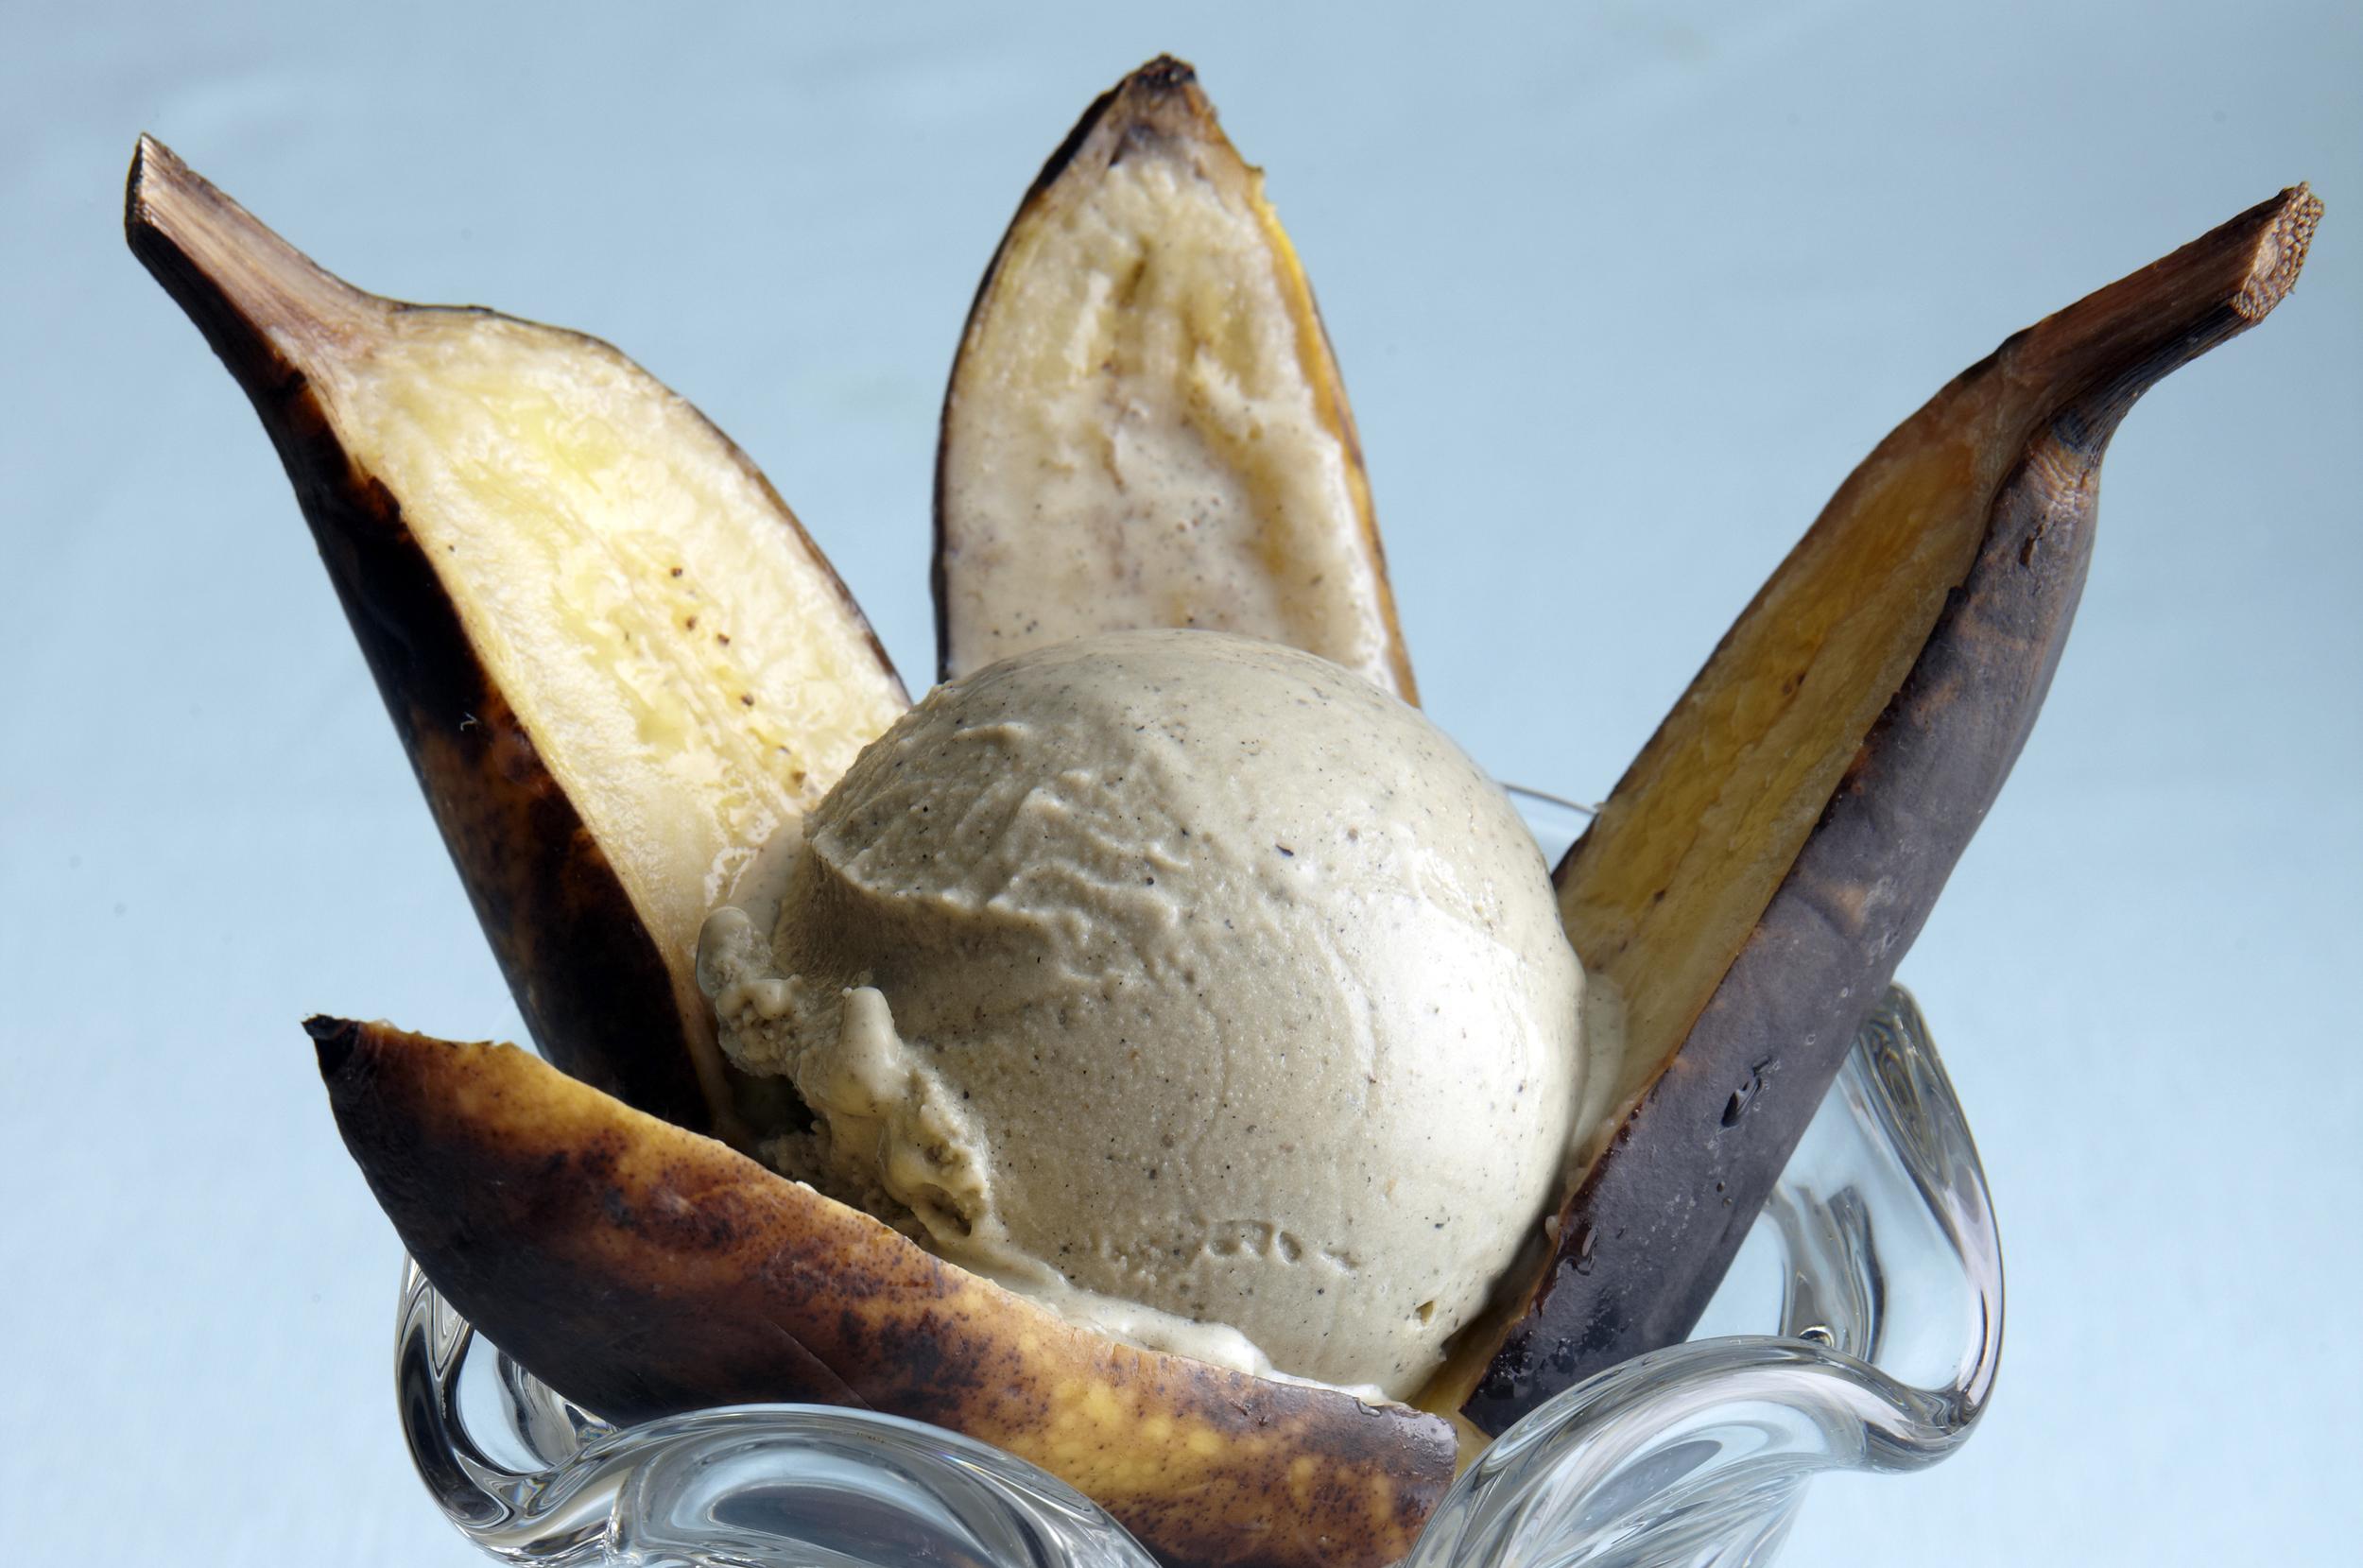 Roasted Banana-Black Sesame Tulip Sundaes   : The sweet, deep flavor of roasted banana is balanced by the boldness of black sesame.